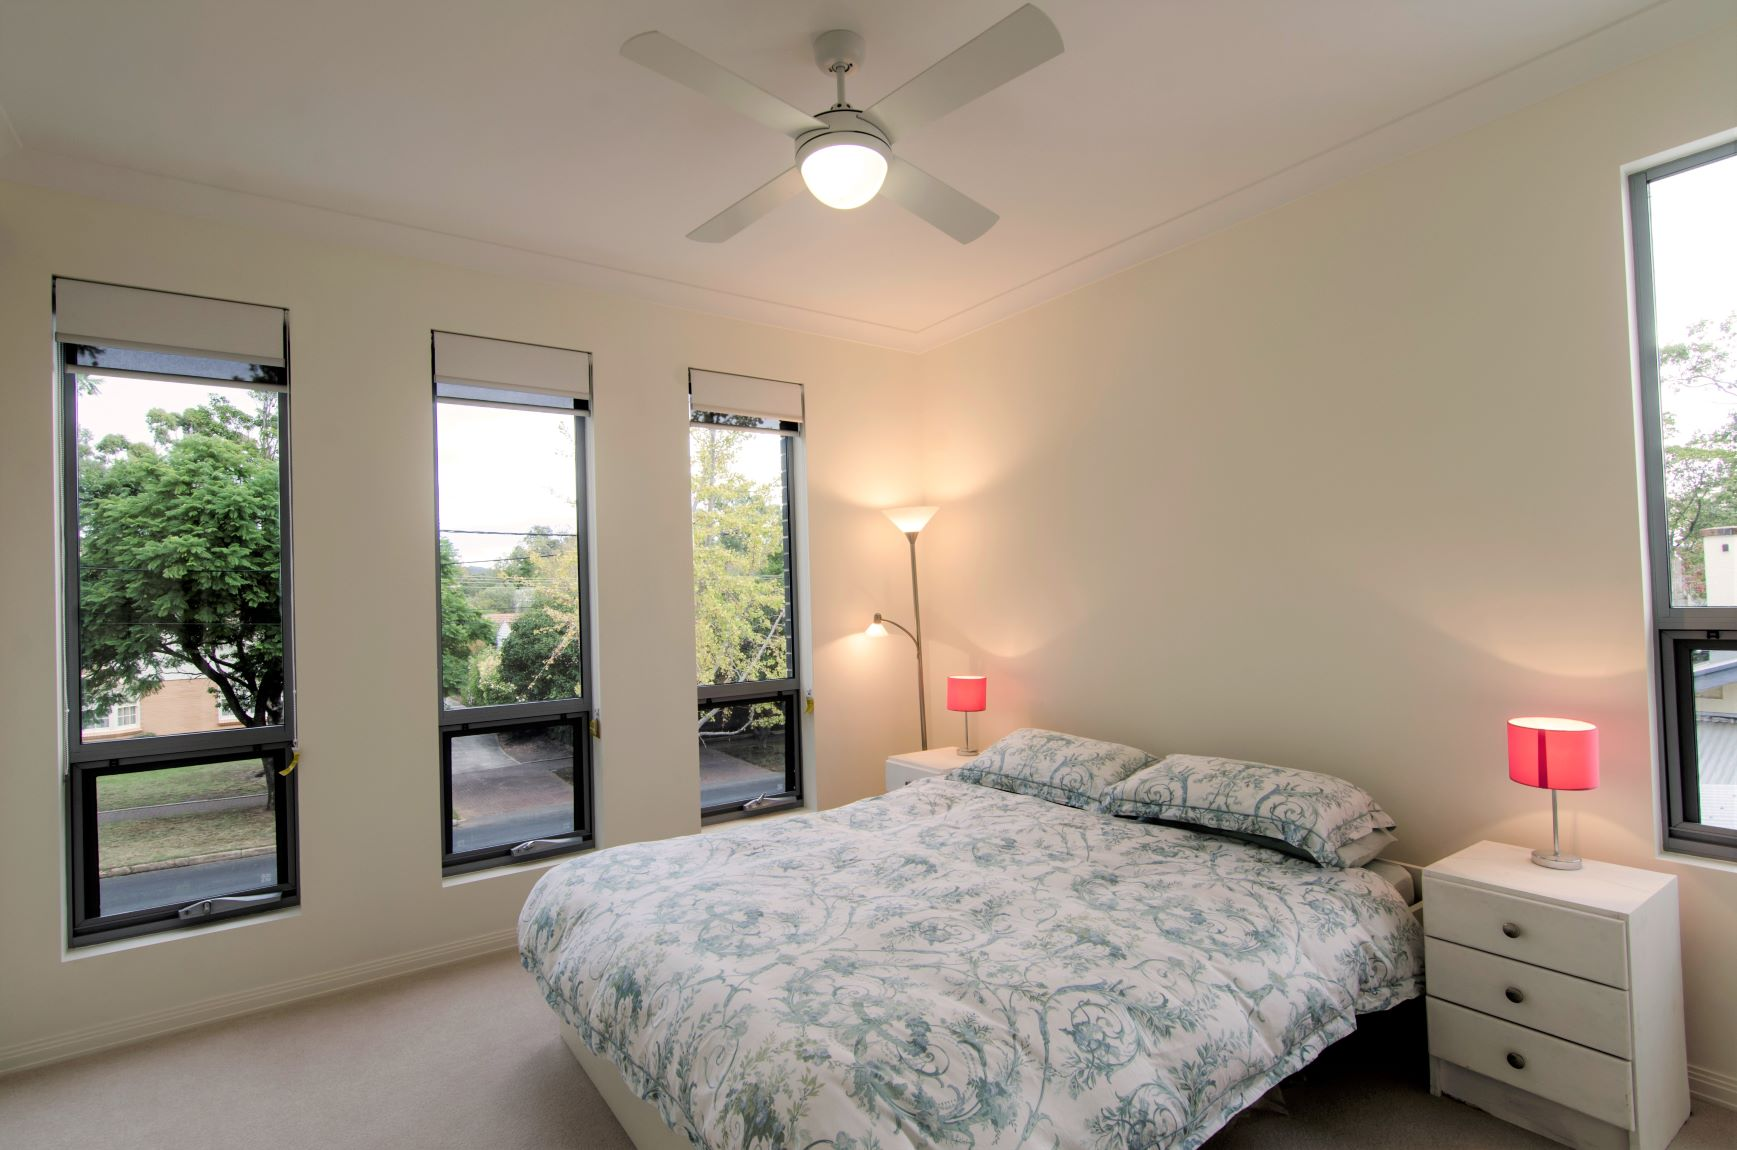 Custom Home, New Home, Family Home, Builders, Design, Tusmore, Adelaide, Two Storey, Bedroom